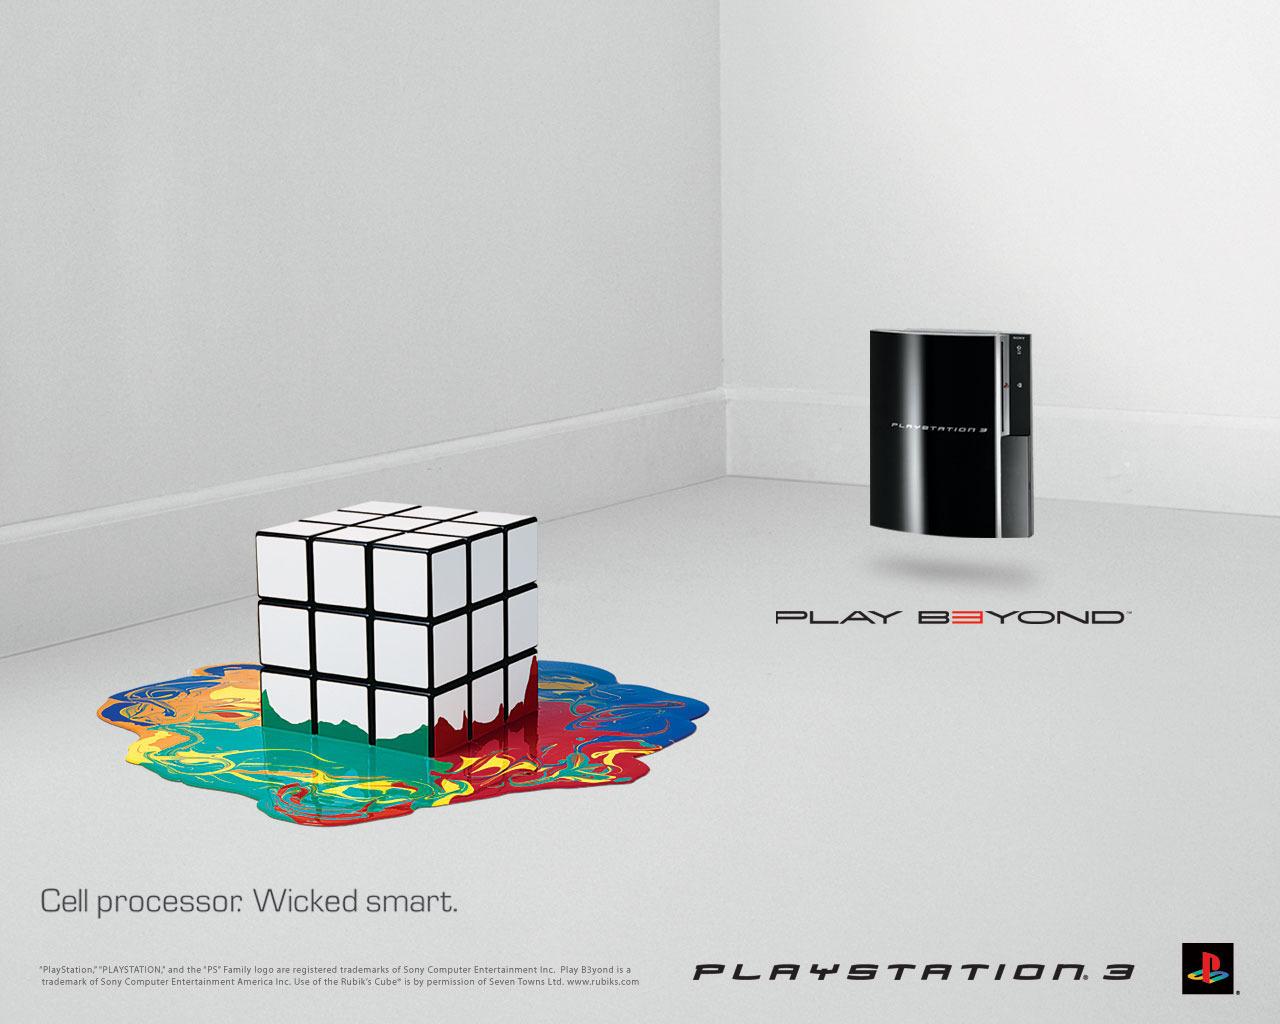 playstation_3-'play_beyond'_4th_commercial-bIGw.jpg